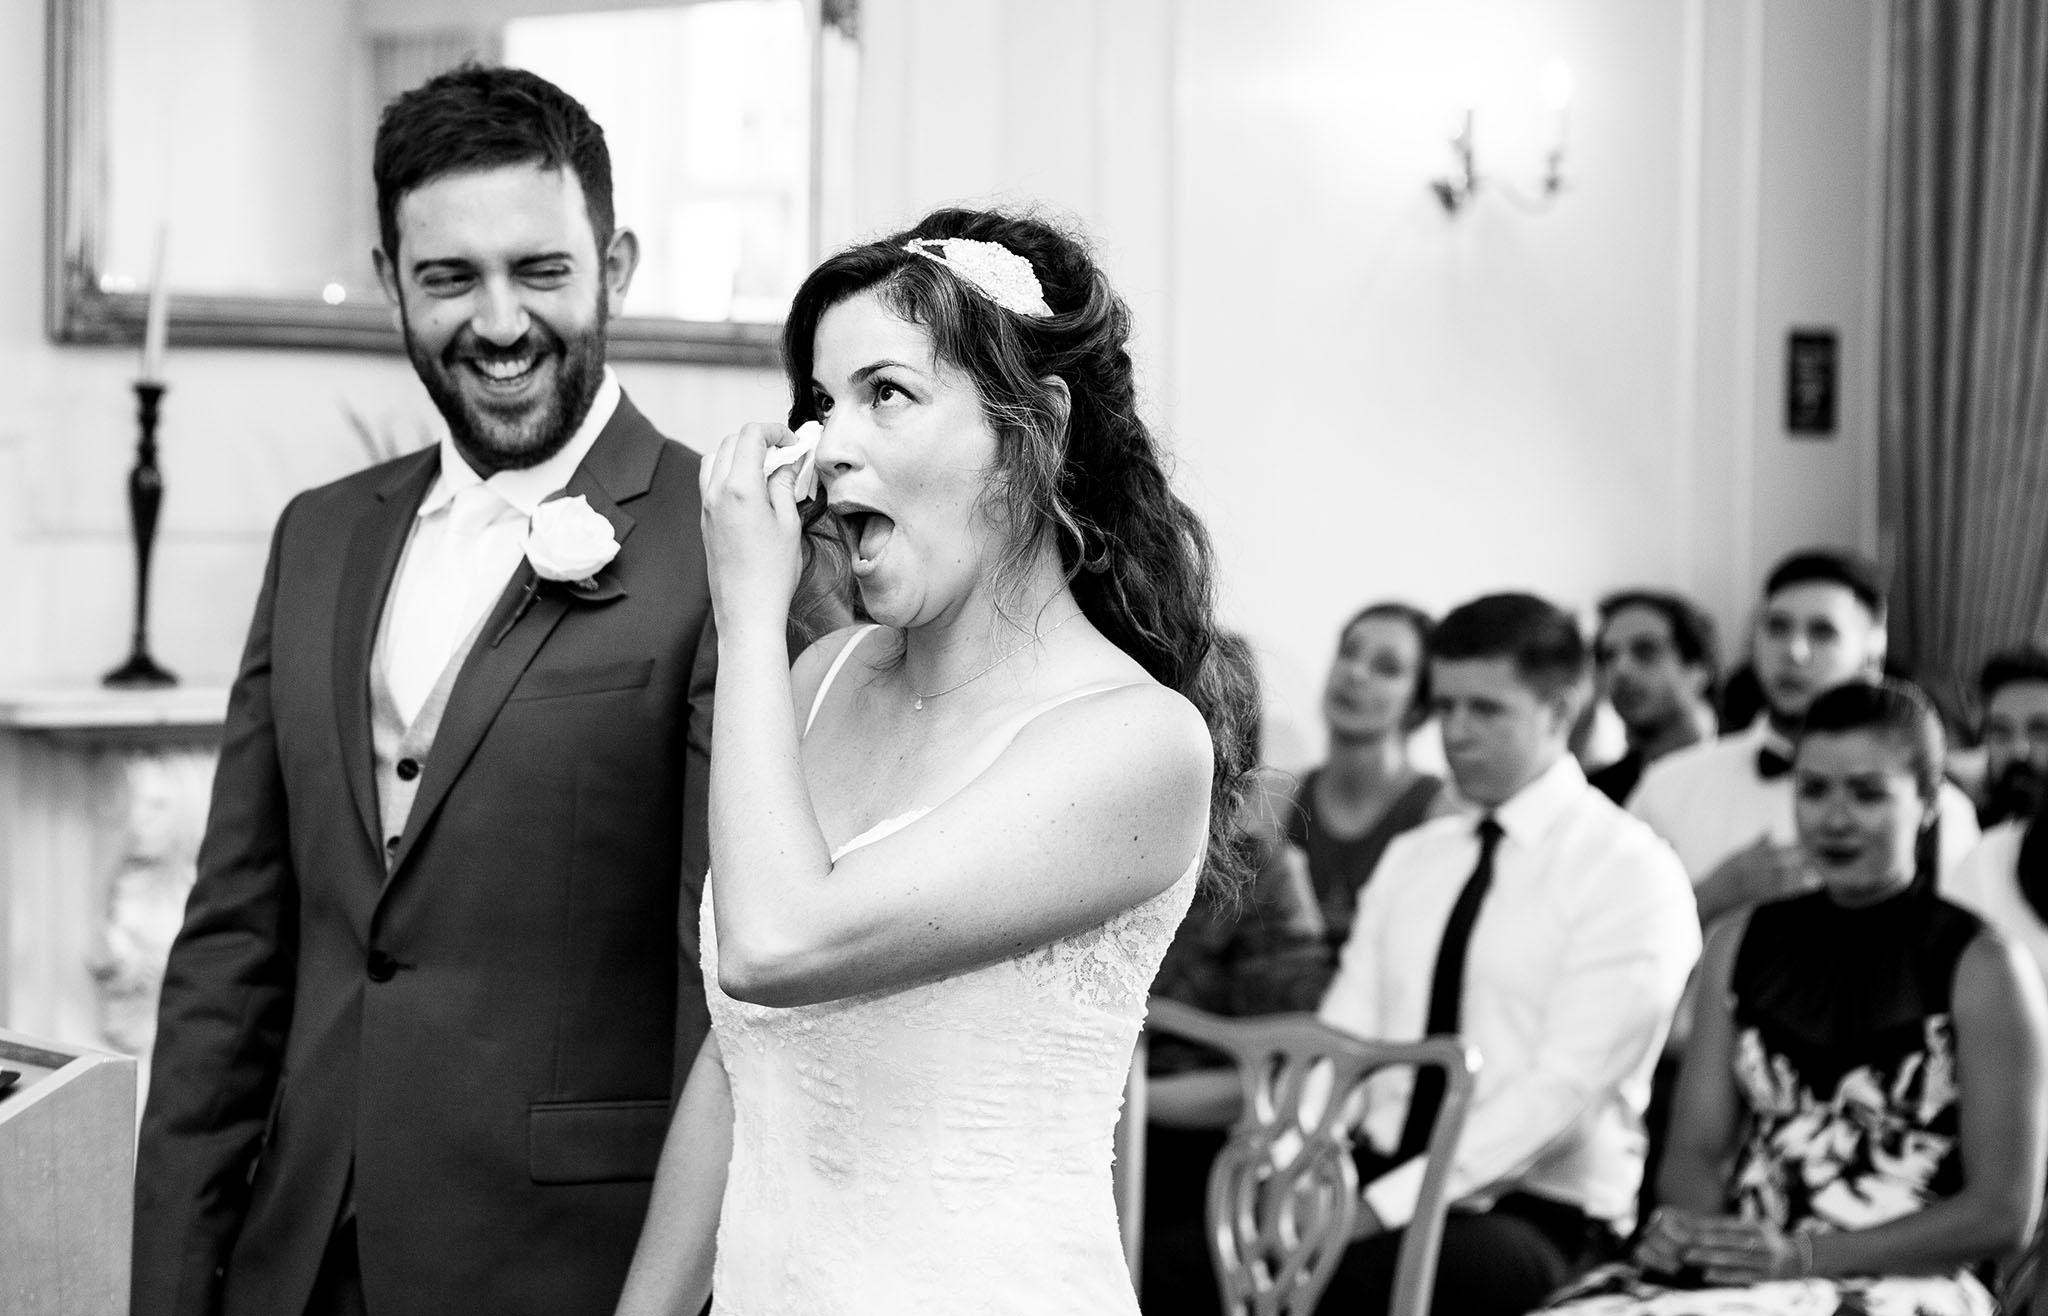 elizabethgphotography_kingslangley_hertfordshire_fineart_wedding_enfield_ricky_nicole_nahlis_17.jpg